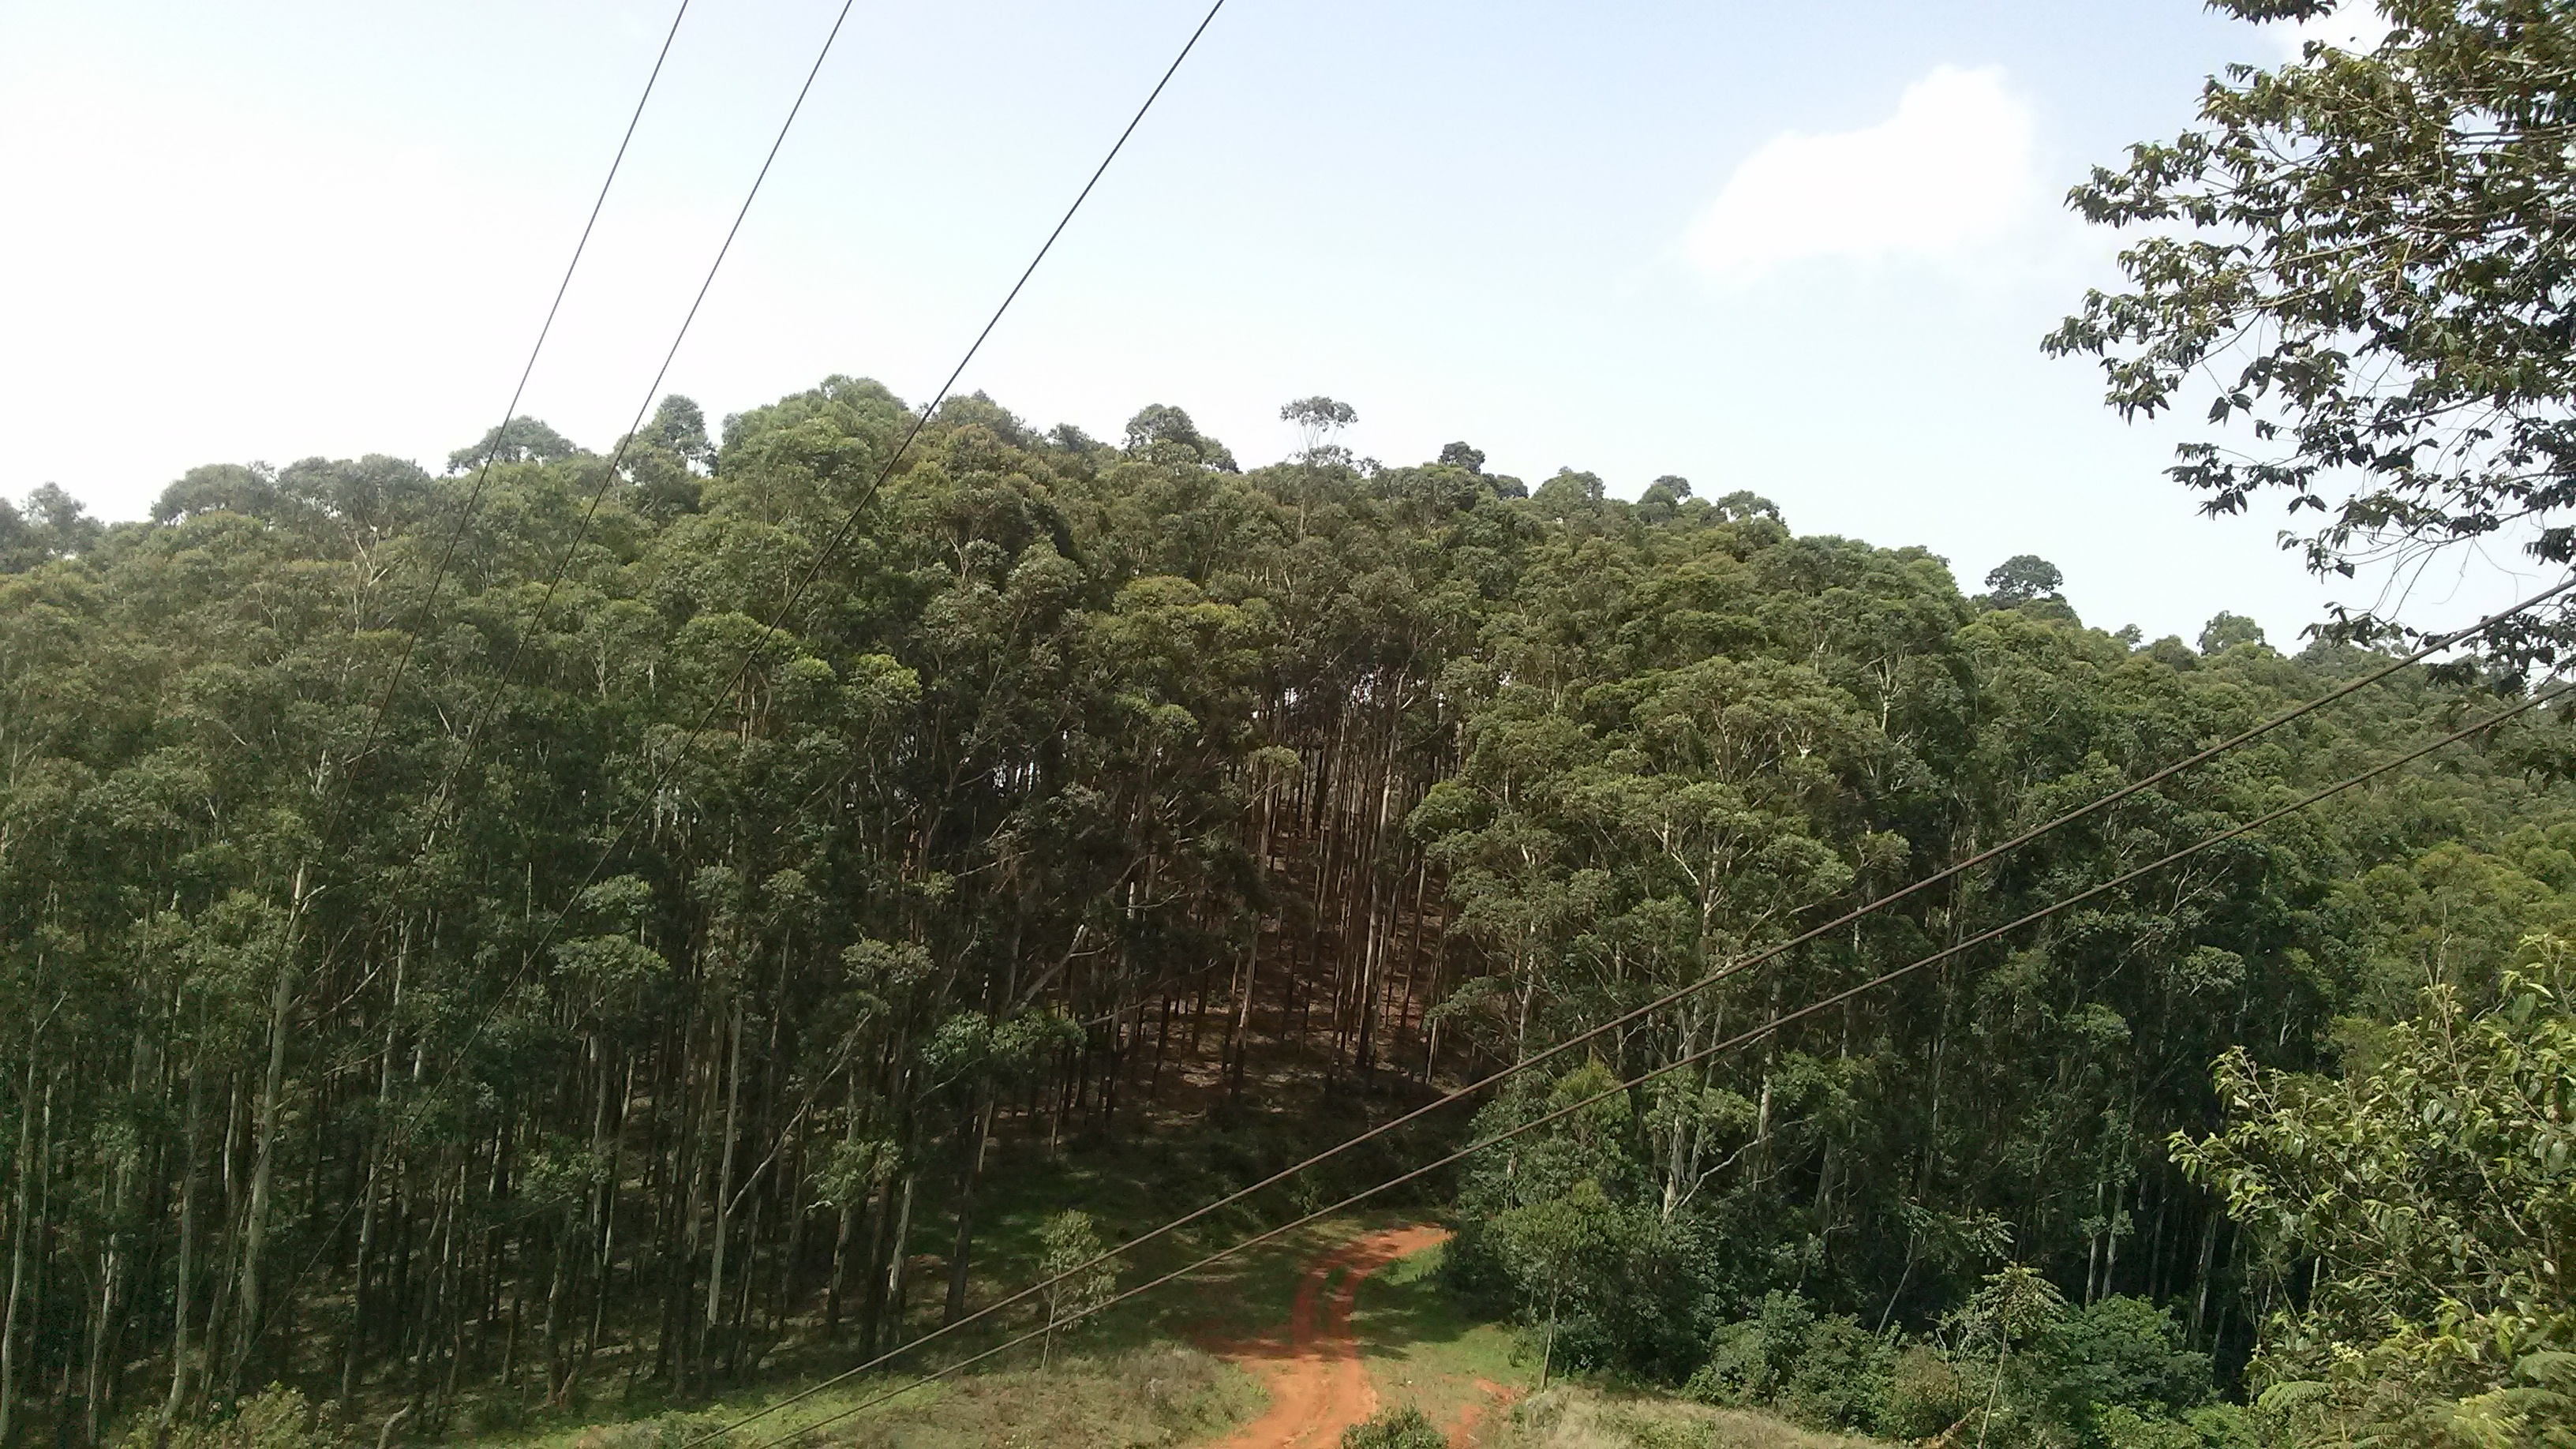 Bapou mountain